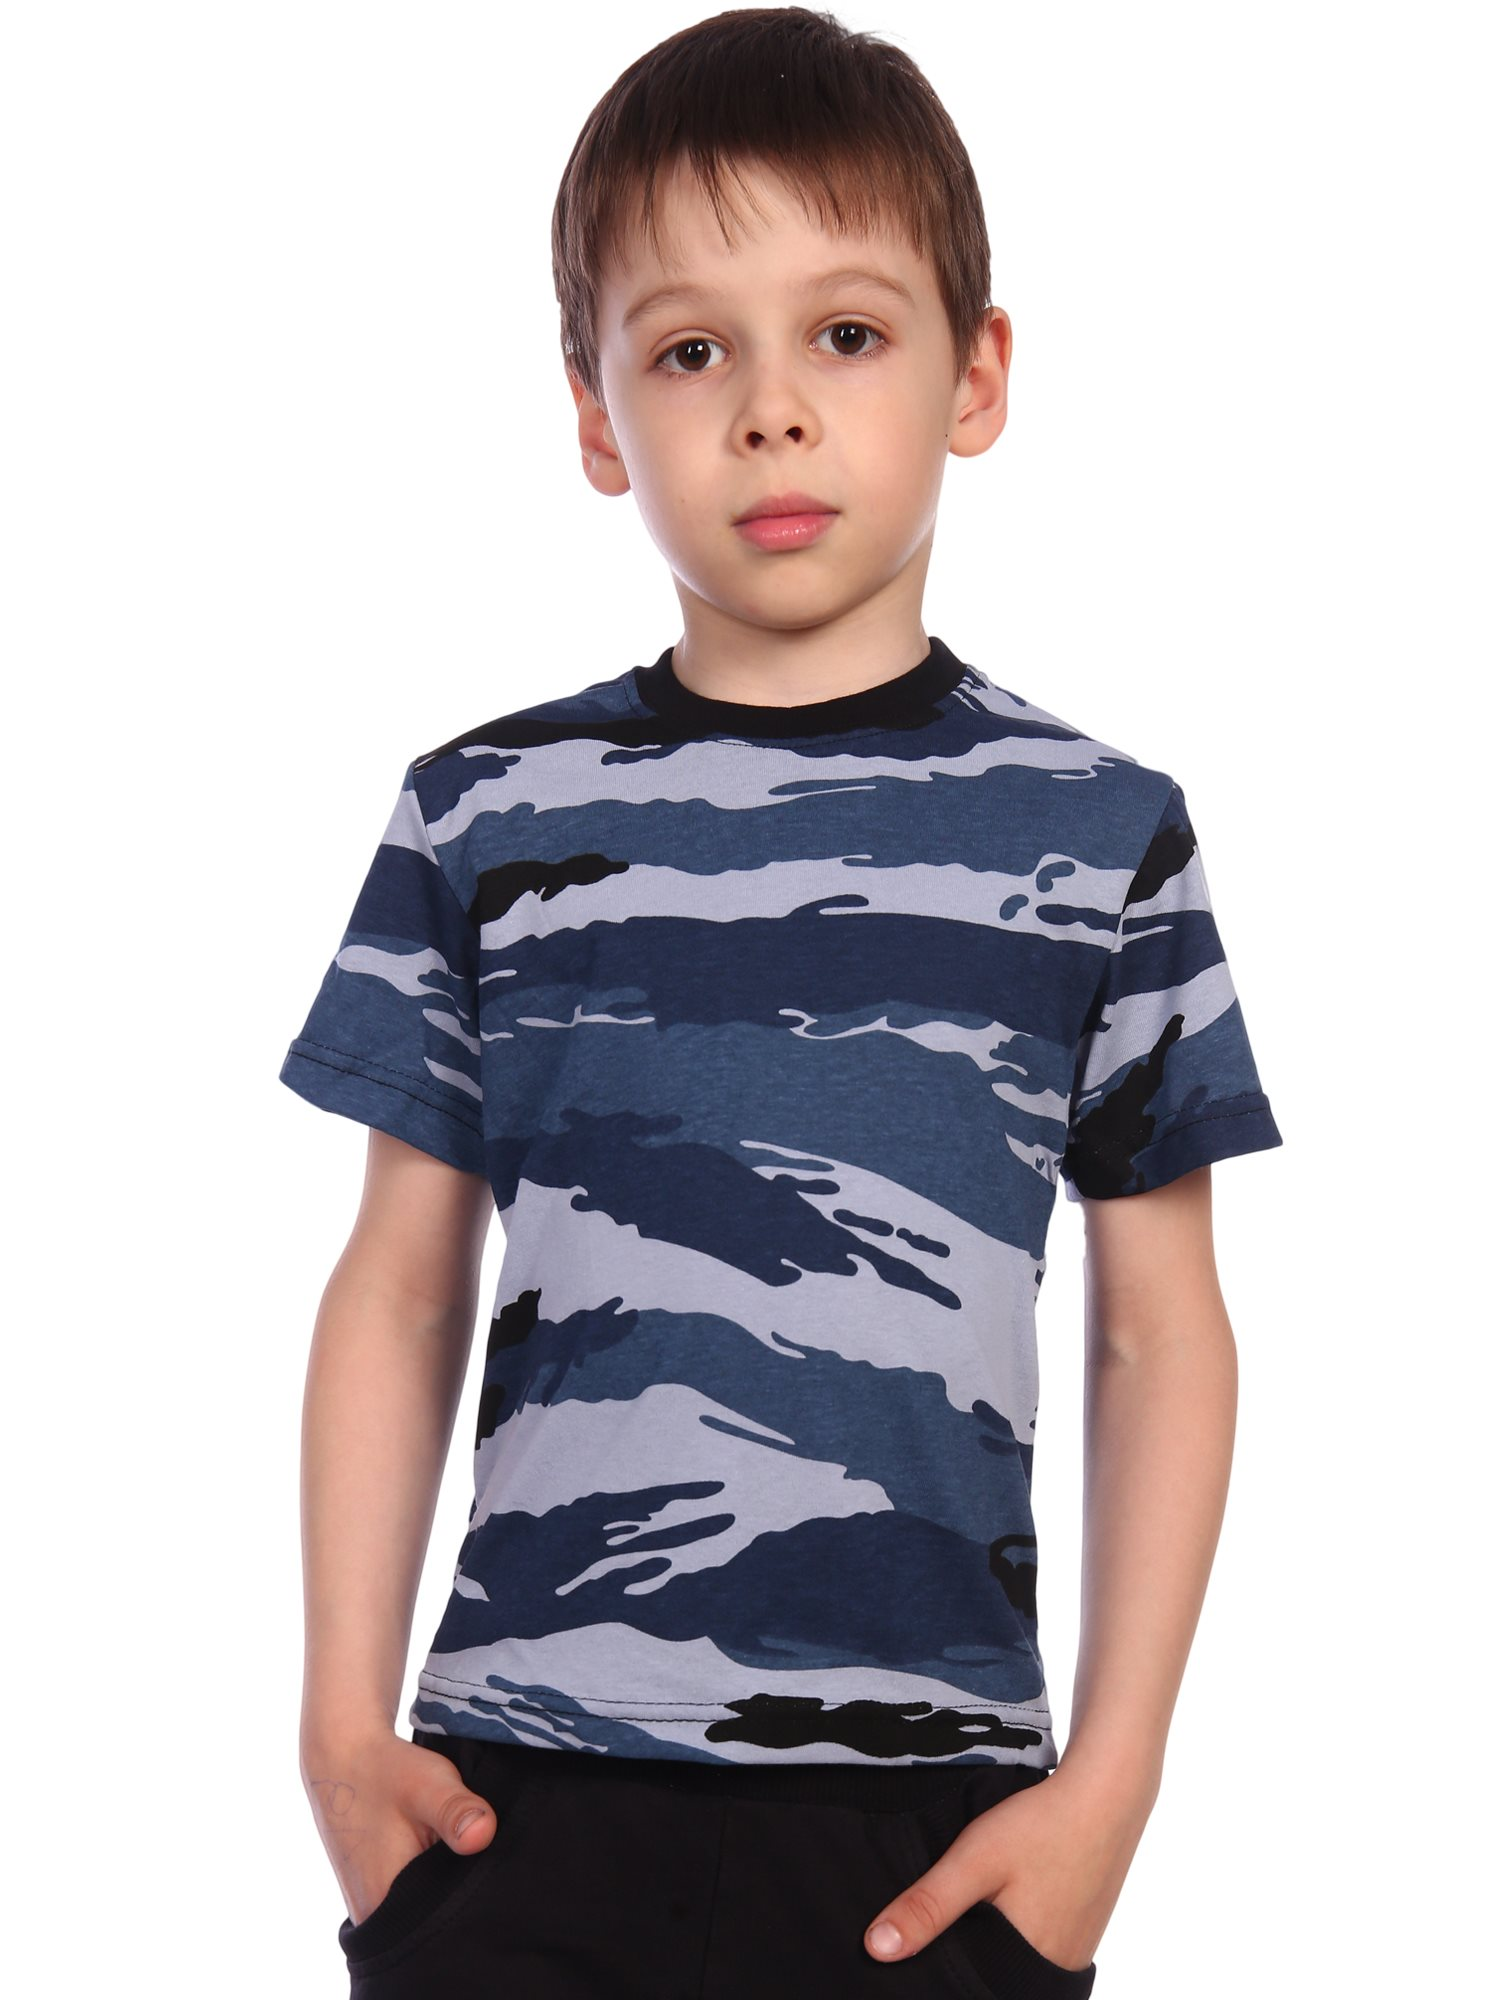 футболка детская (кулирка) камыш голубой